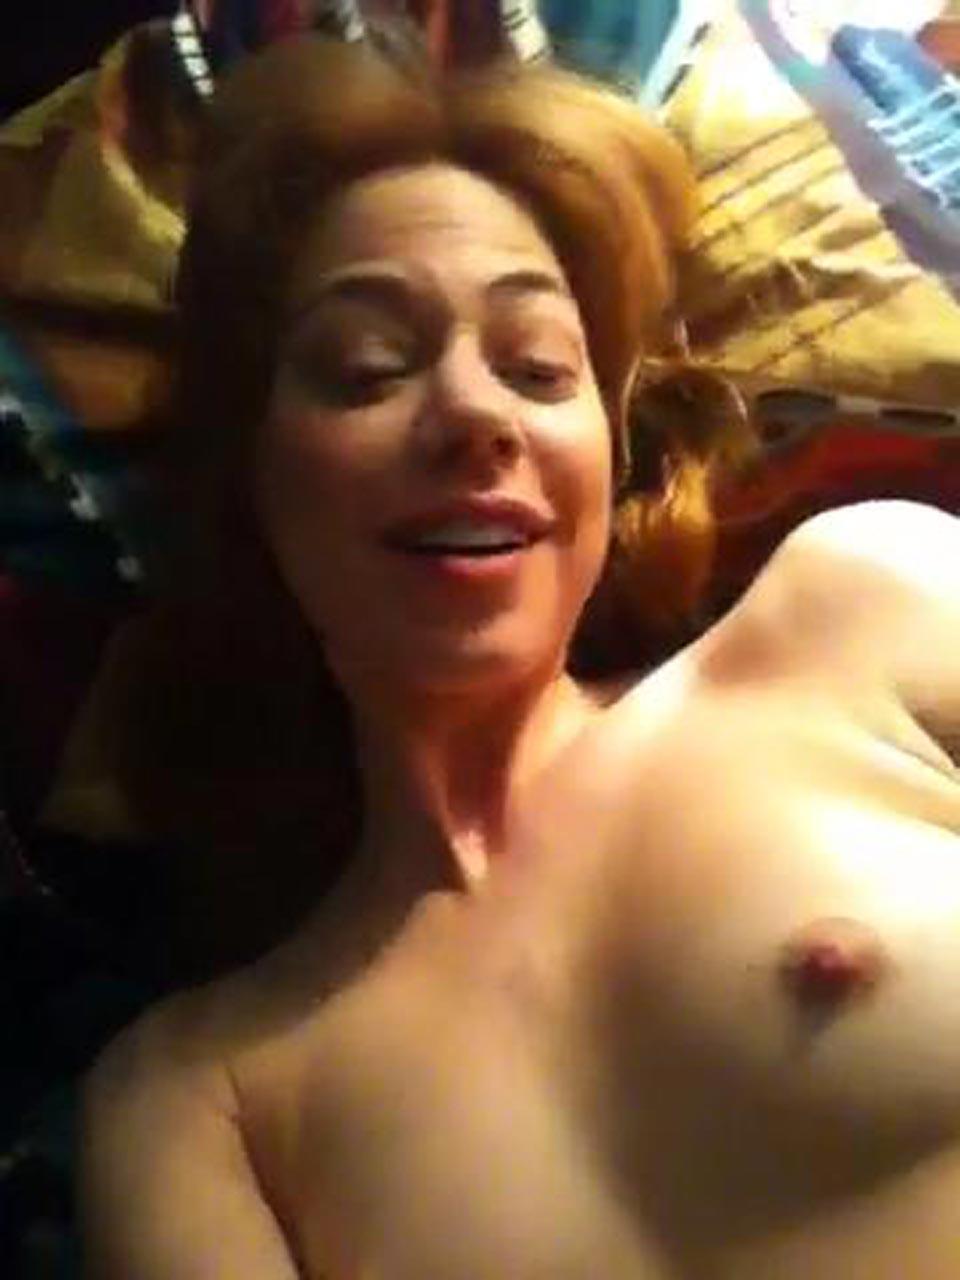 Analeigh Tipton Topless analeigh tipton masturbation leaked cellphone video